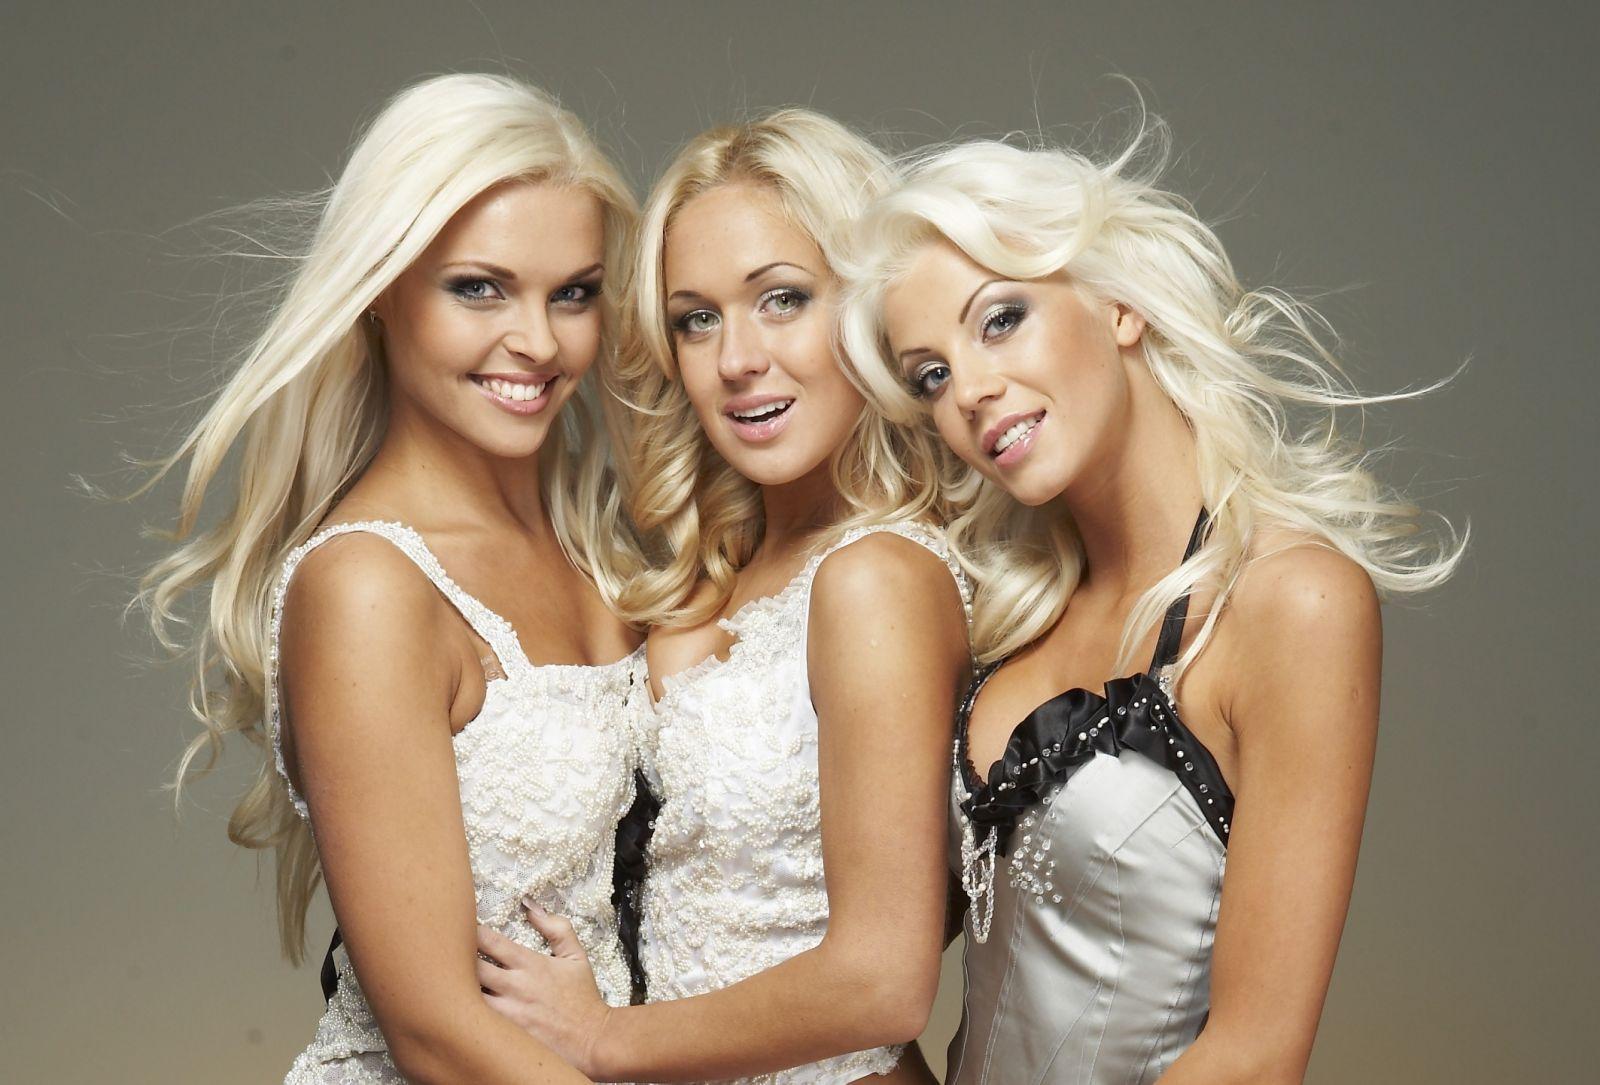 Lithuanian shaven girls